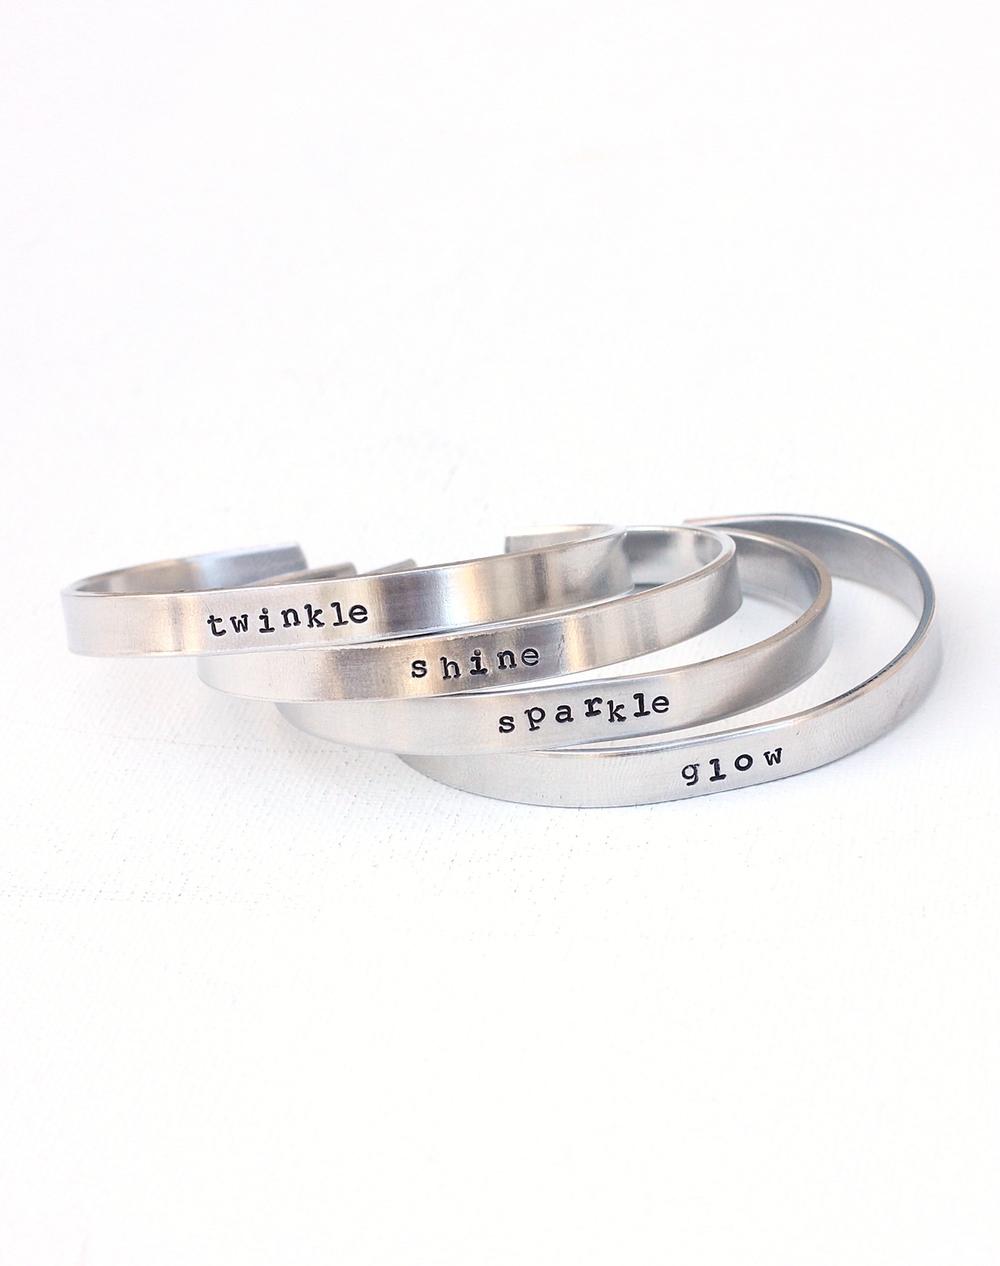 twinkle_shine_sparkle_glow_ hand stamped bracelets 046.JPG